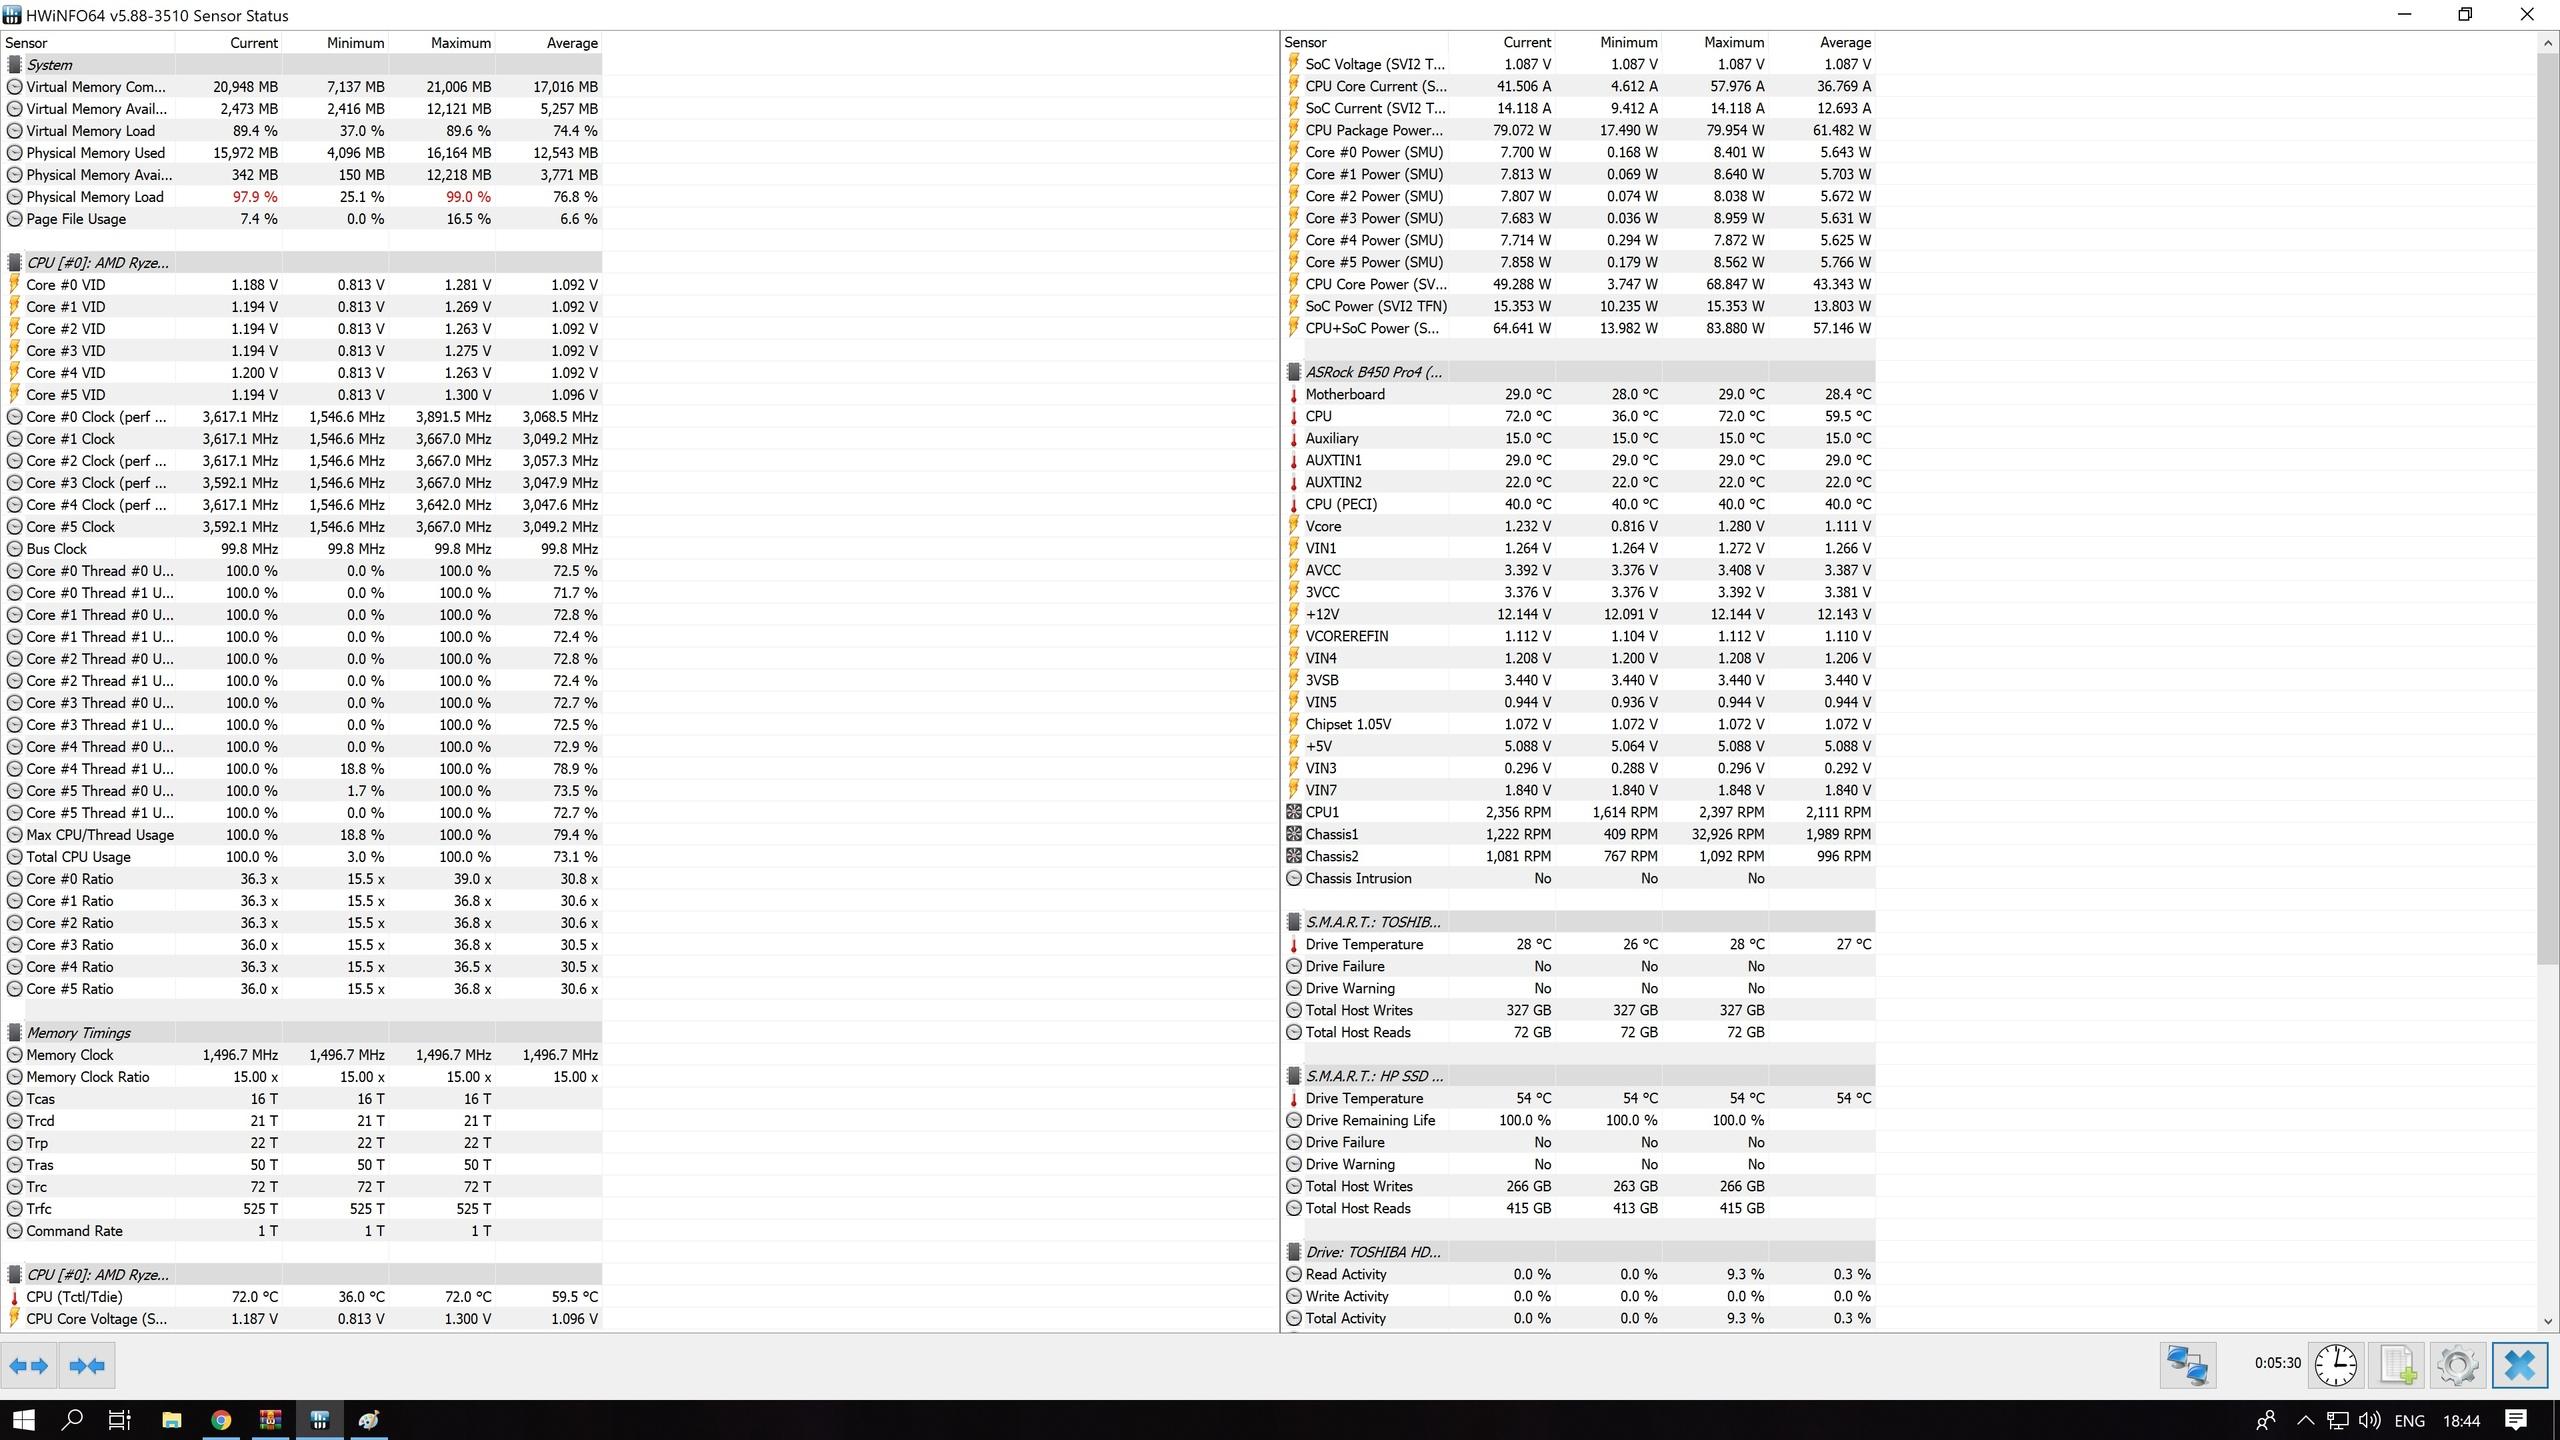 b450 pro4 + ryzen 5 2600 high temperature - ASRock Forums